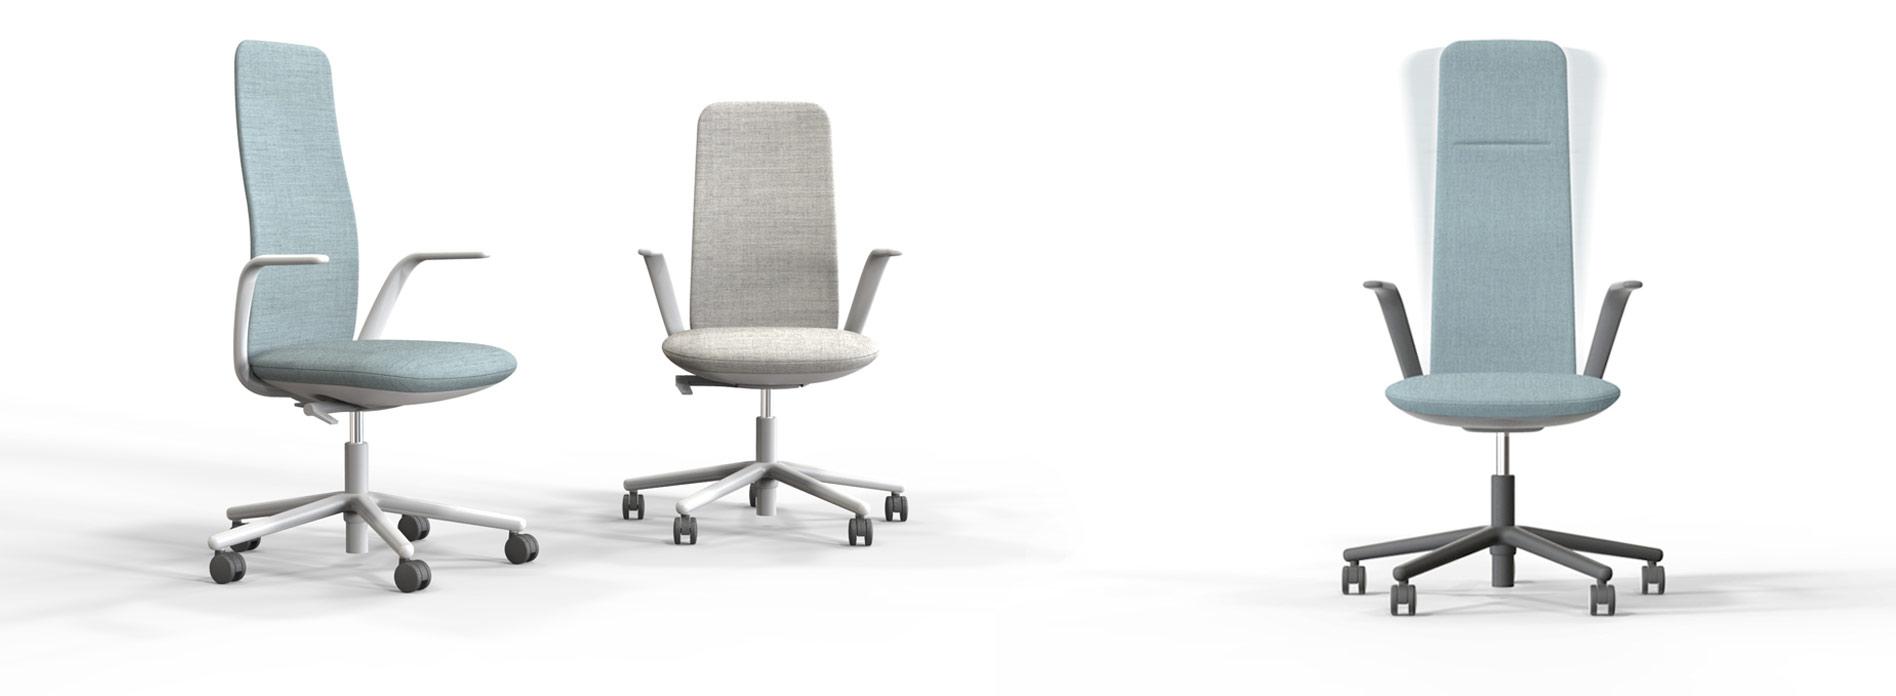 Nia task chair